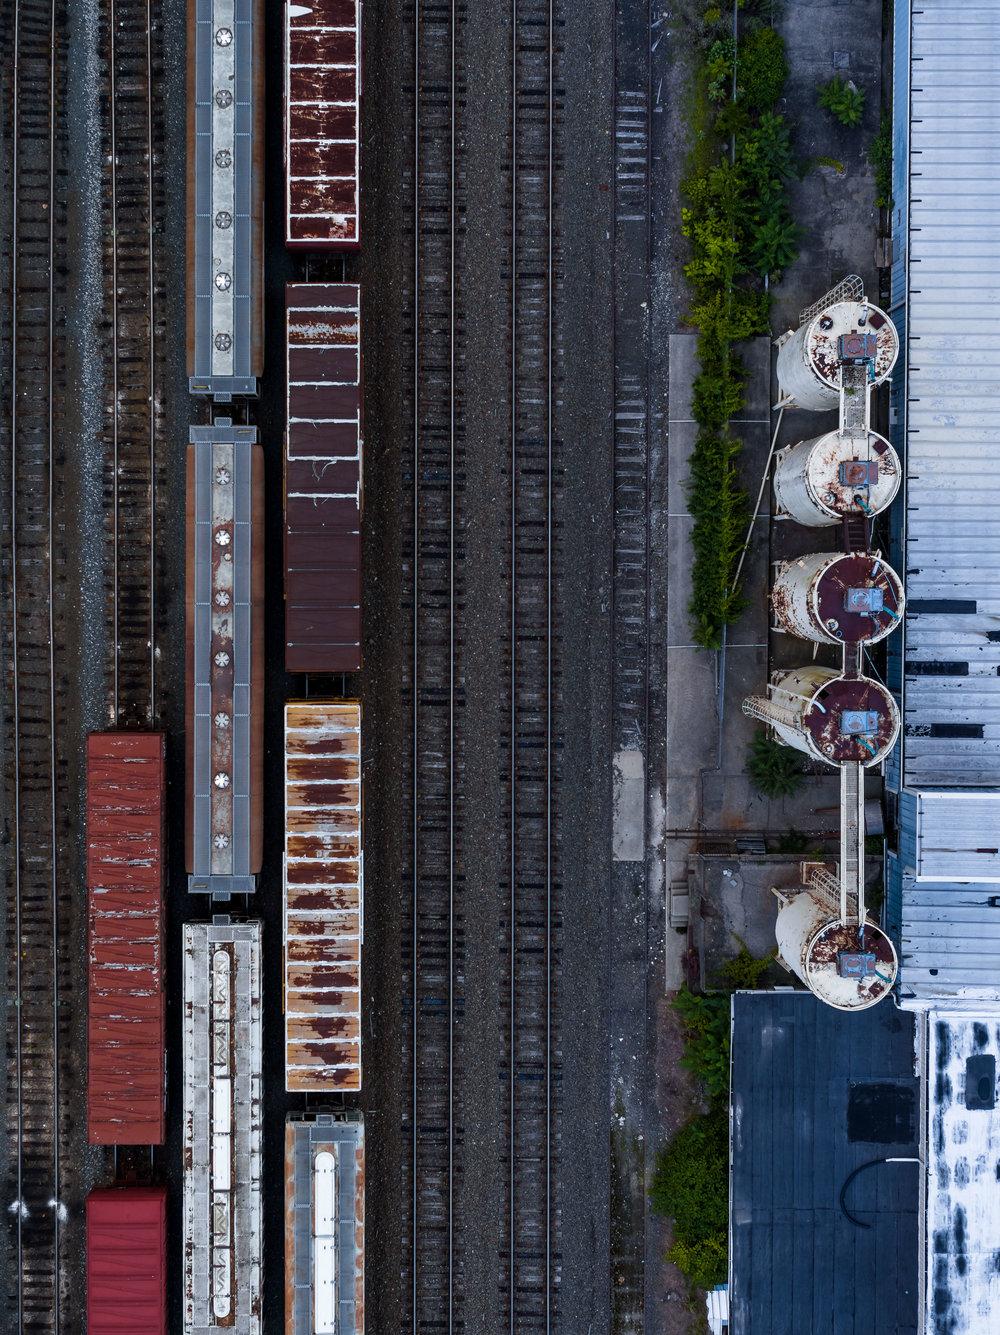 trainpatterns_typoland_aerial-1.jpg